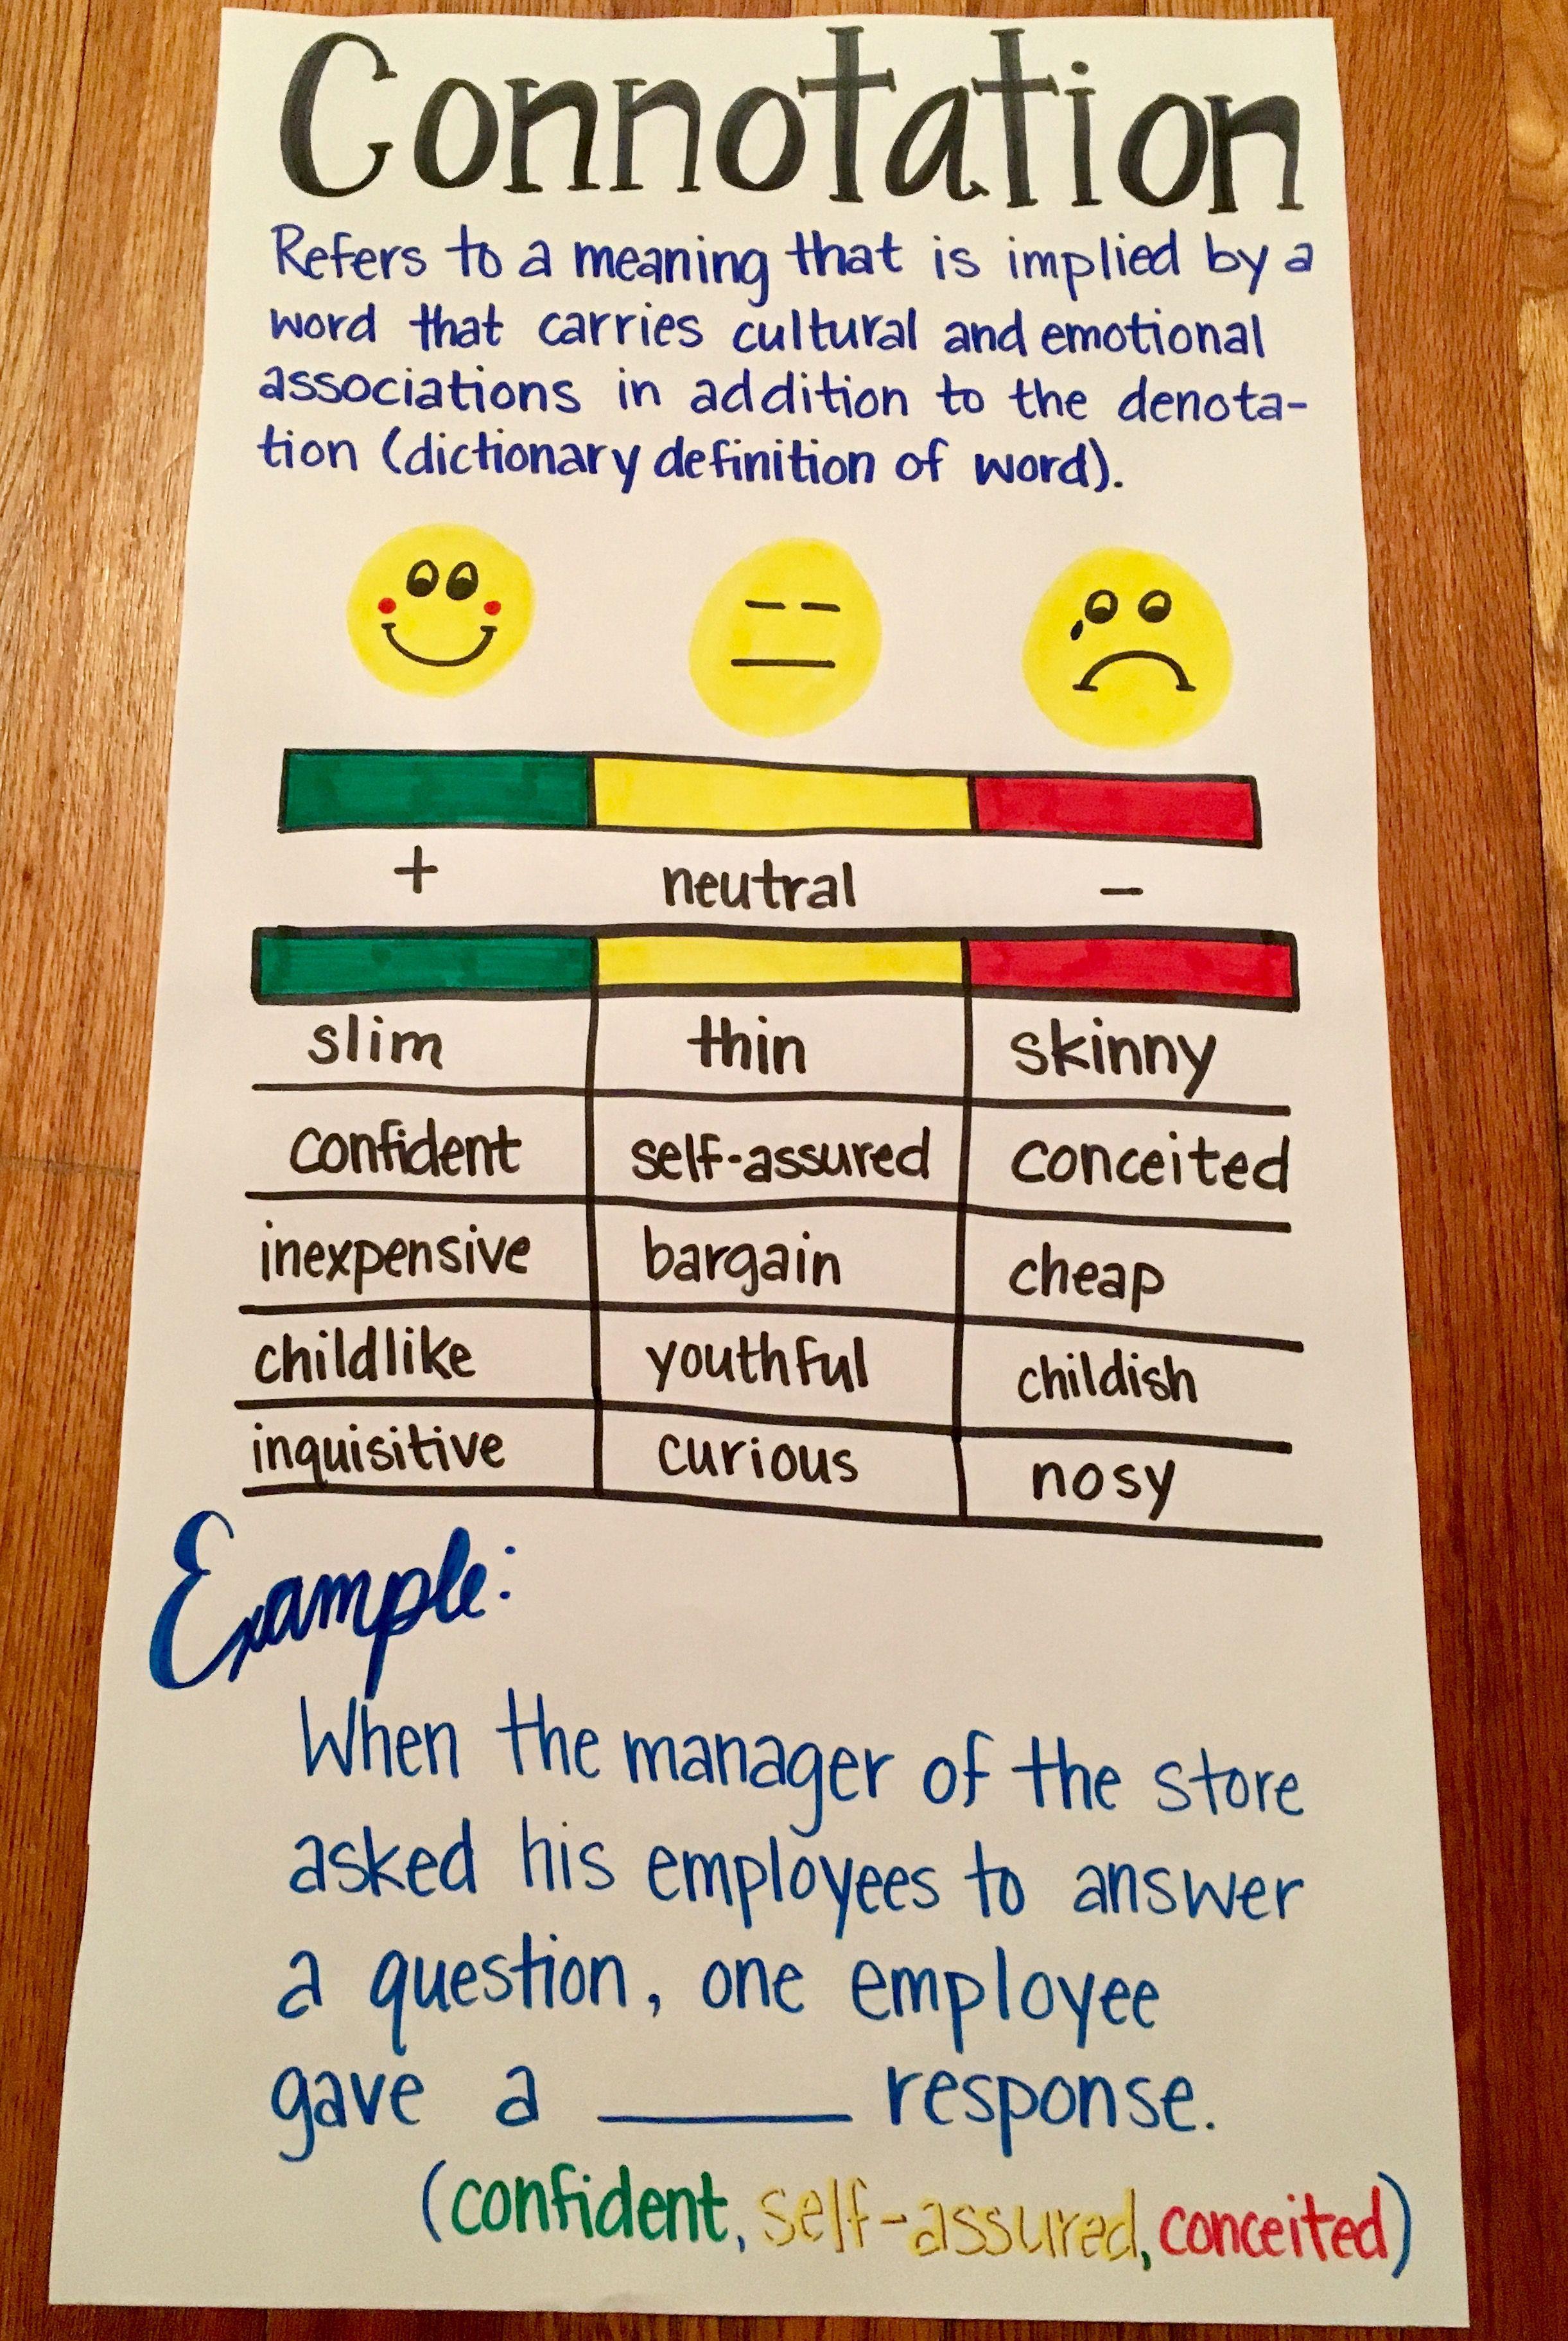 Connotation Anchor Chart